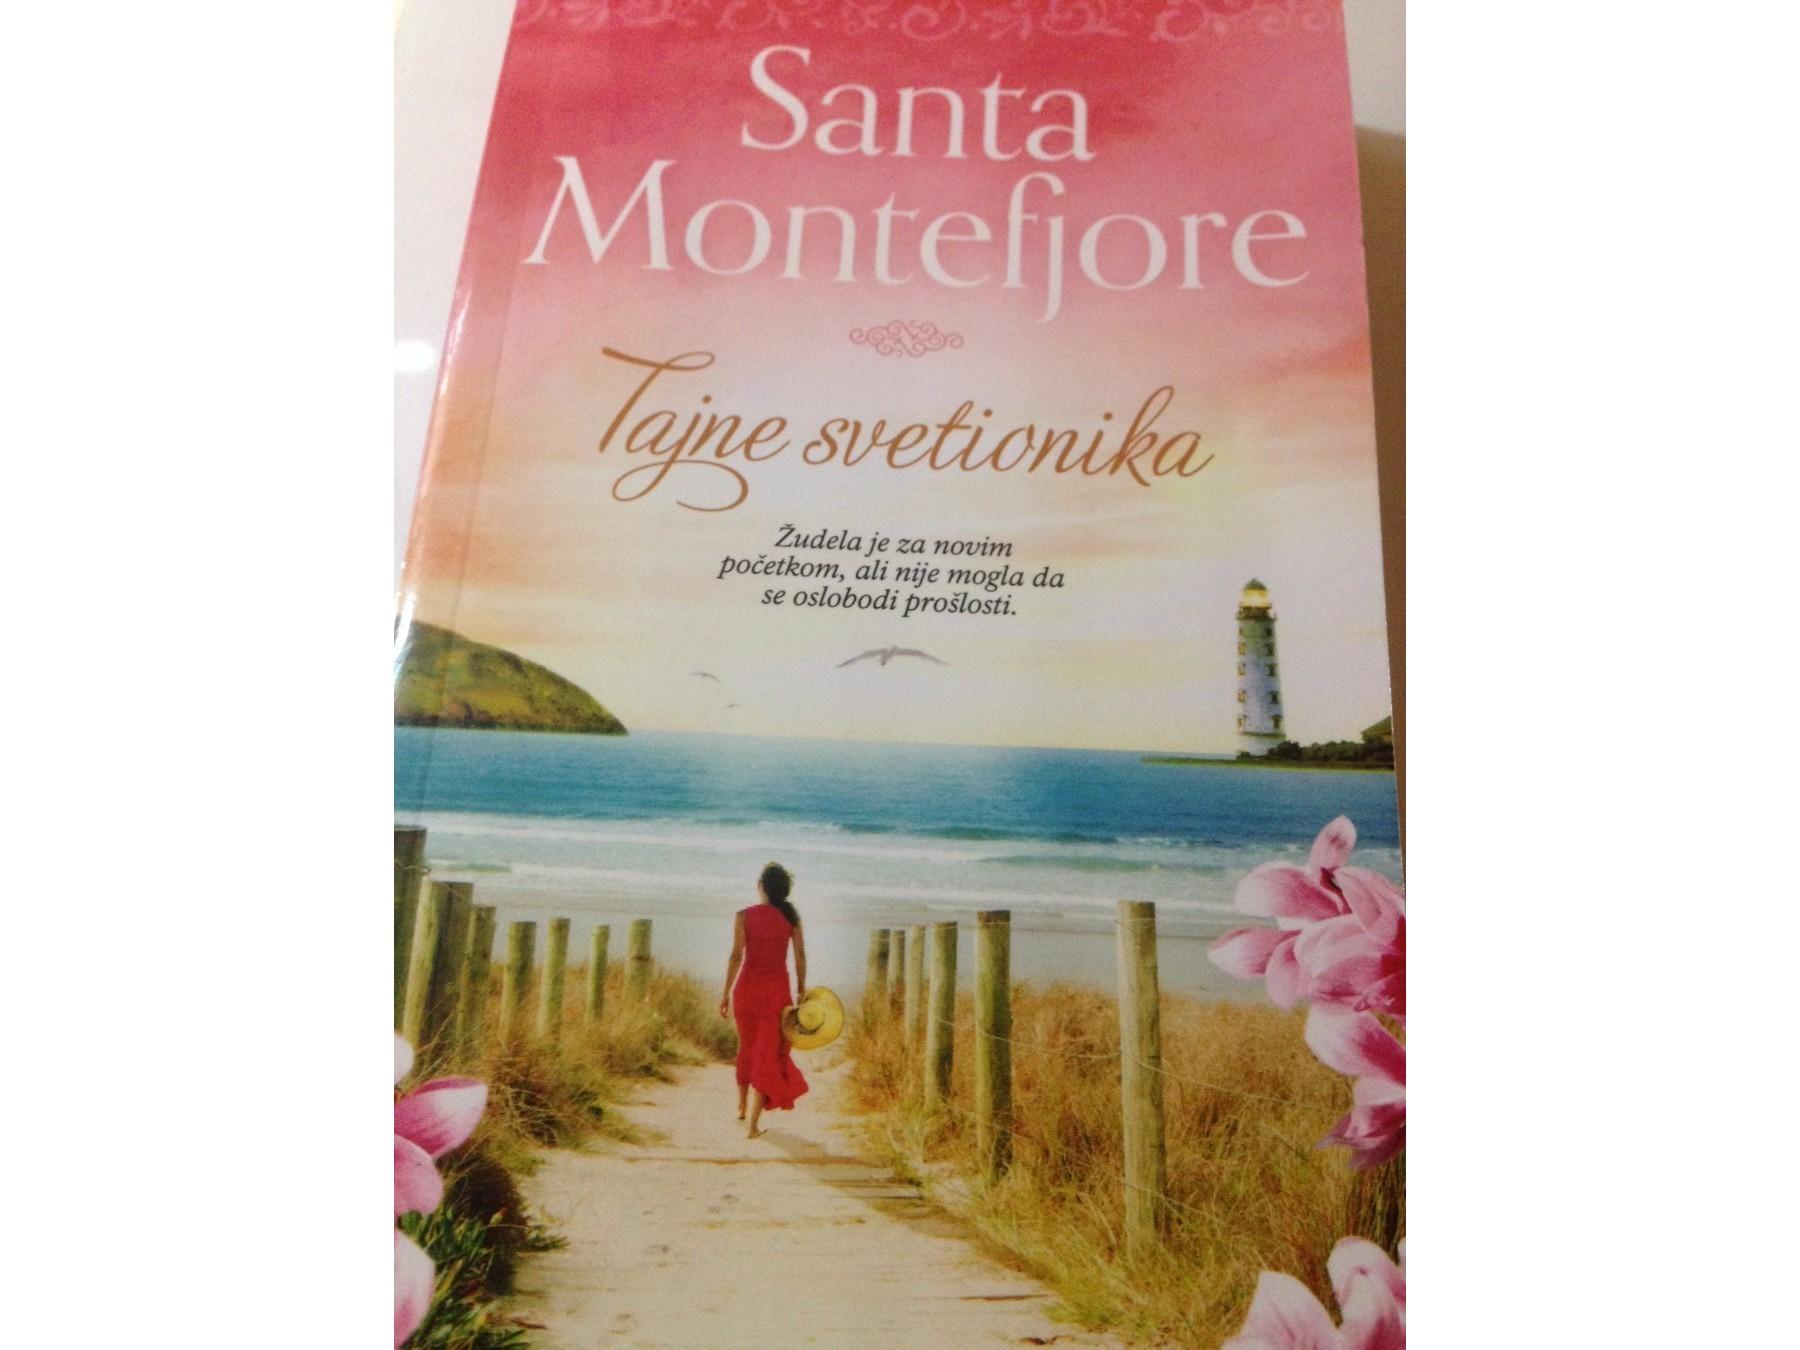 Tajna svetionika – Santa Montefjore